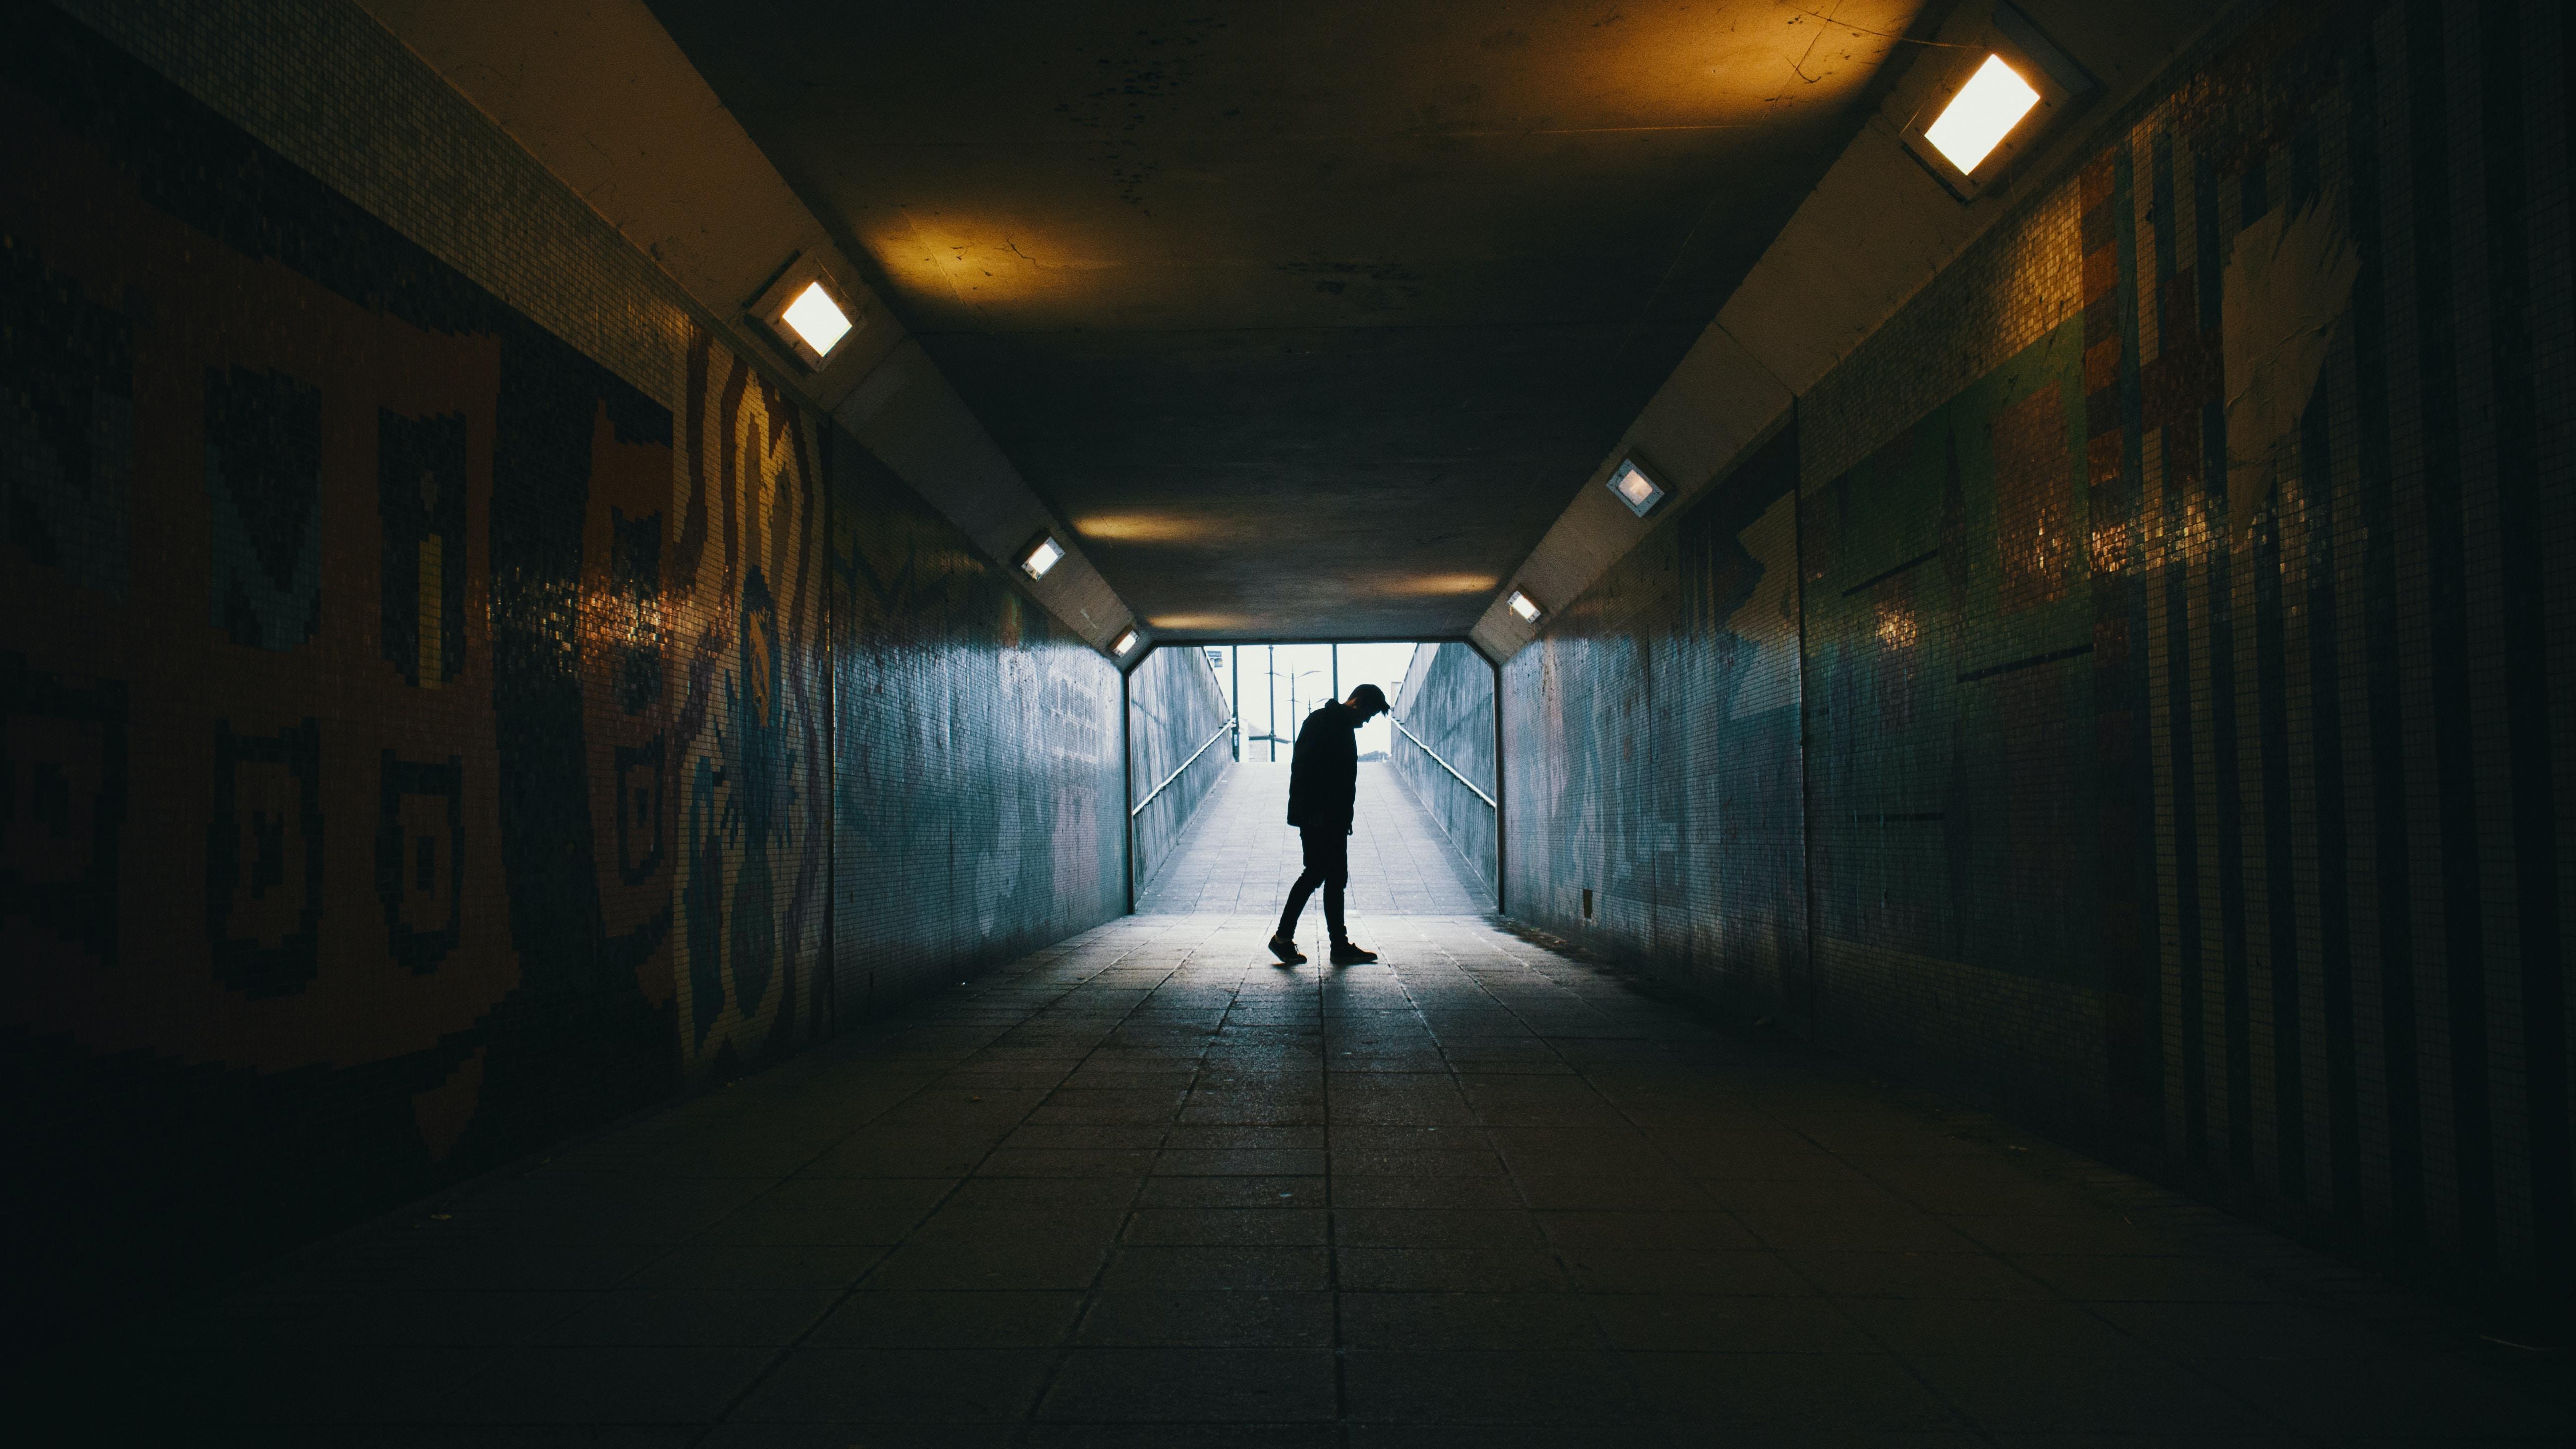 Silhouette of sad person walking through an urban tunnel